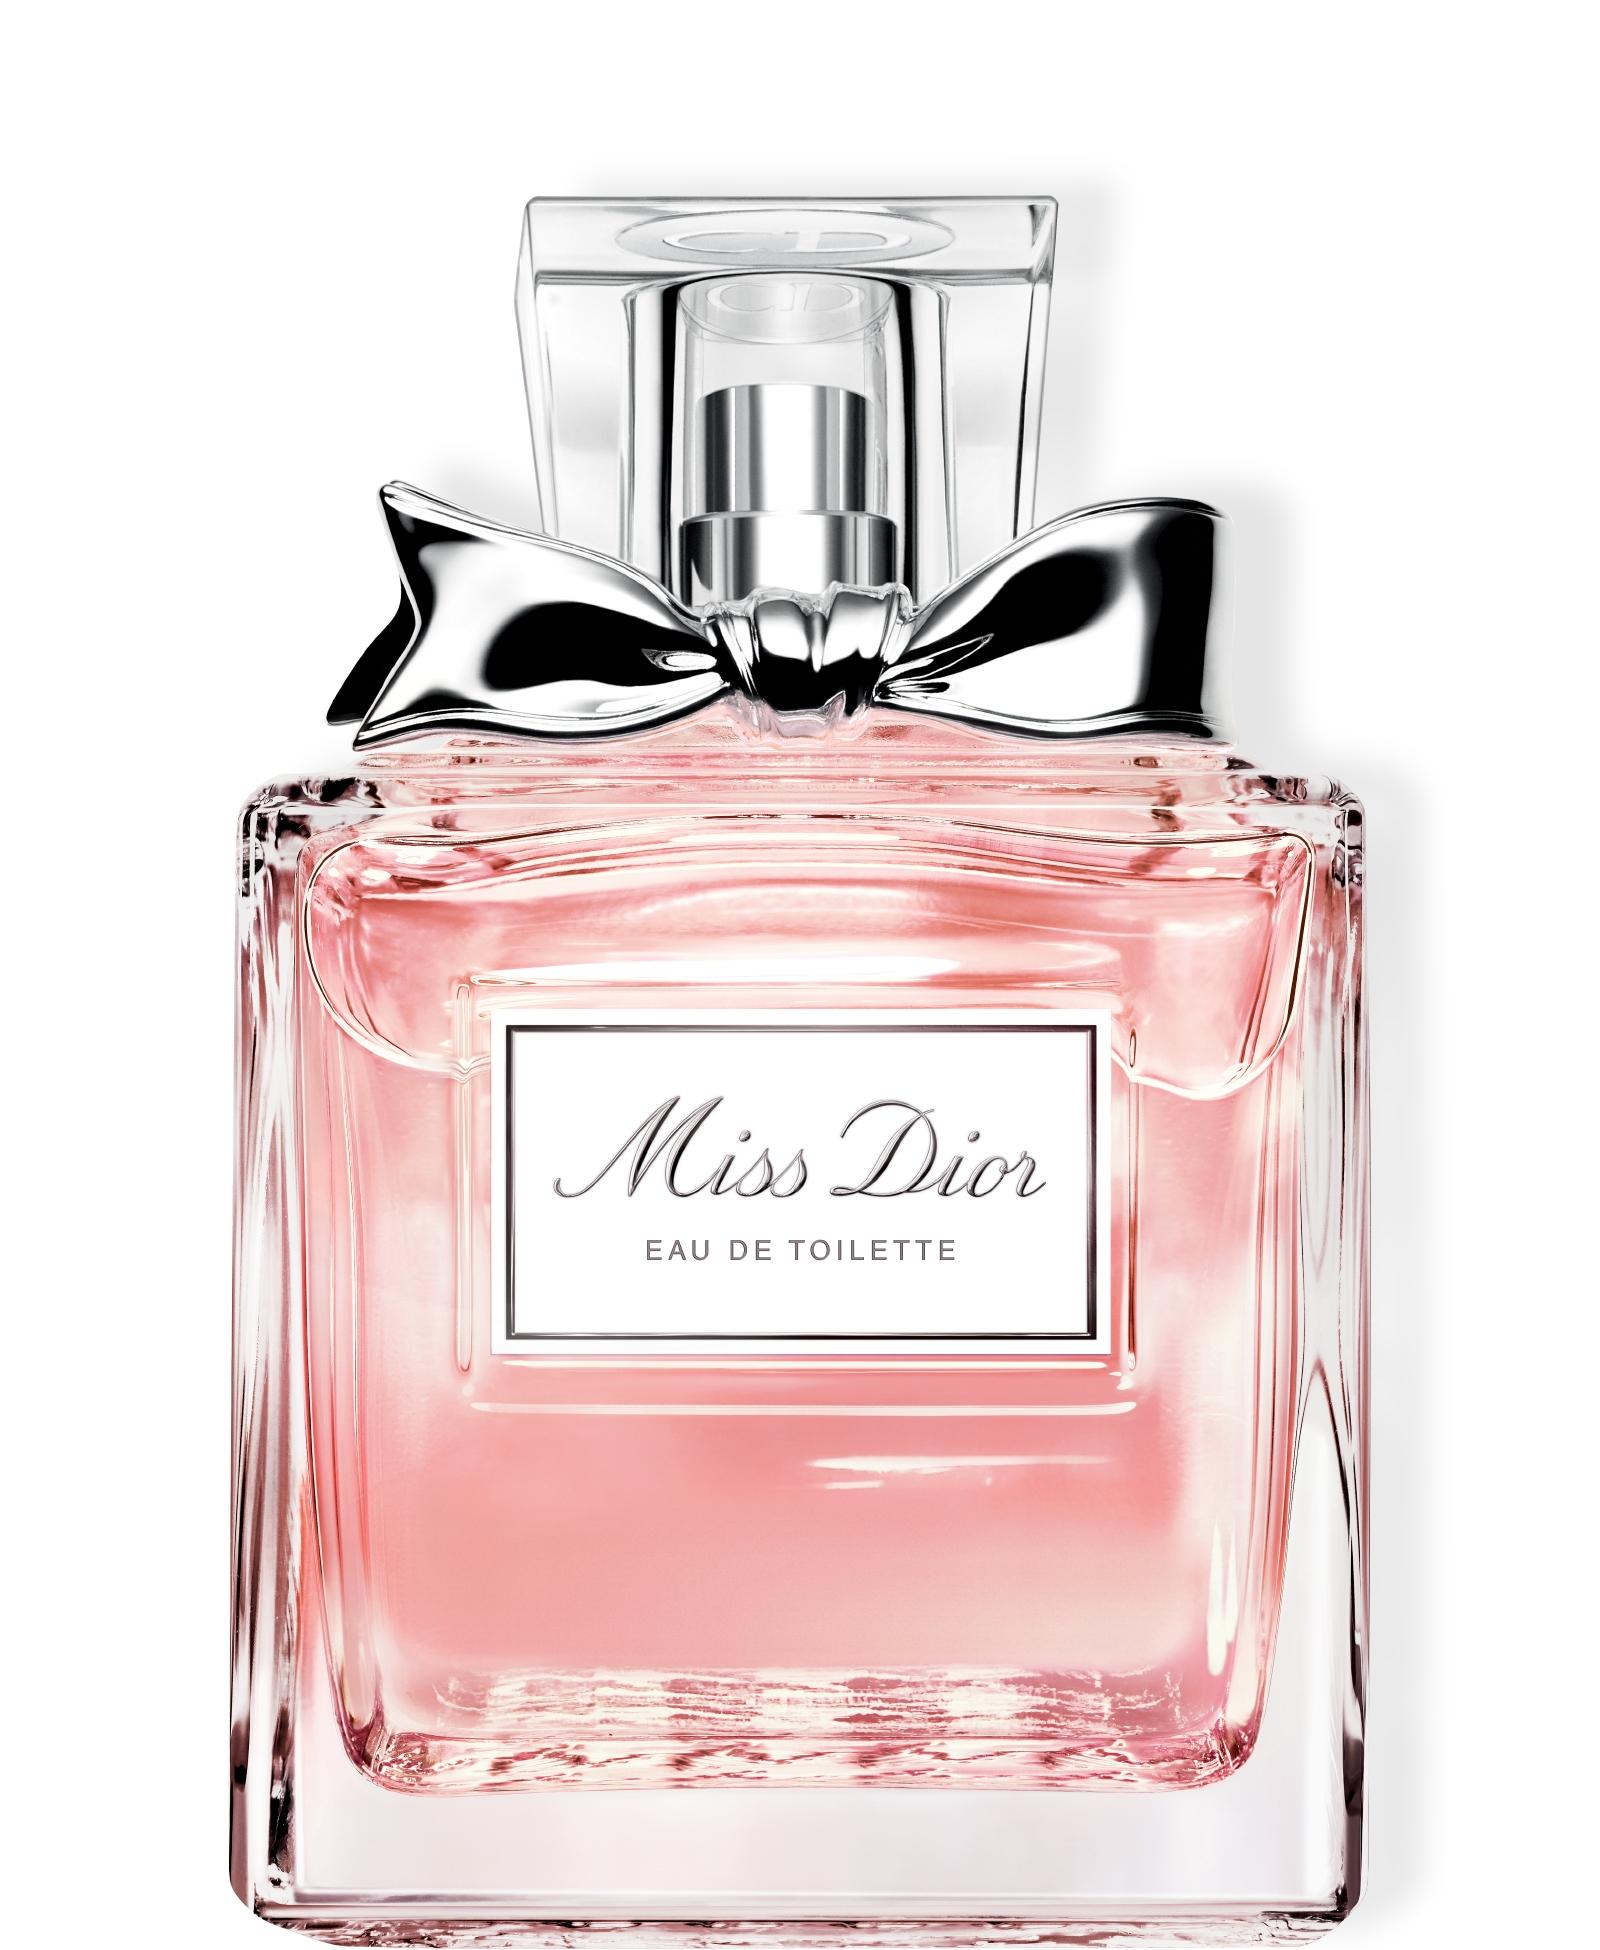 DIOR Miss Dior Eau de Toilette, 100 ml